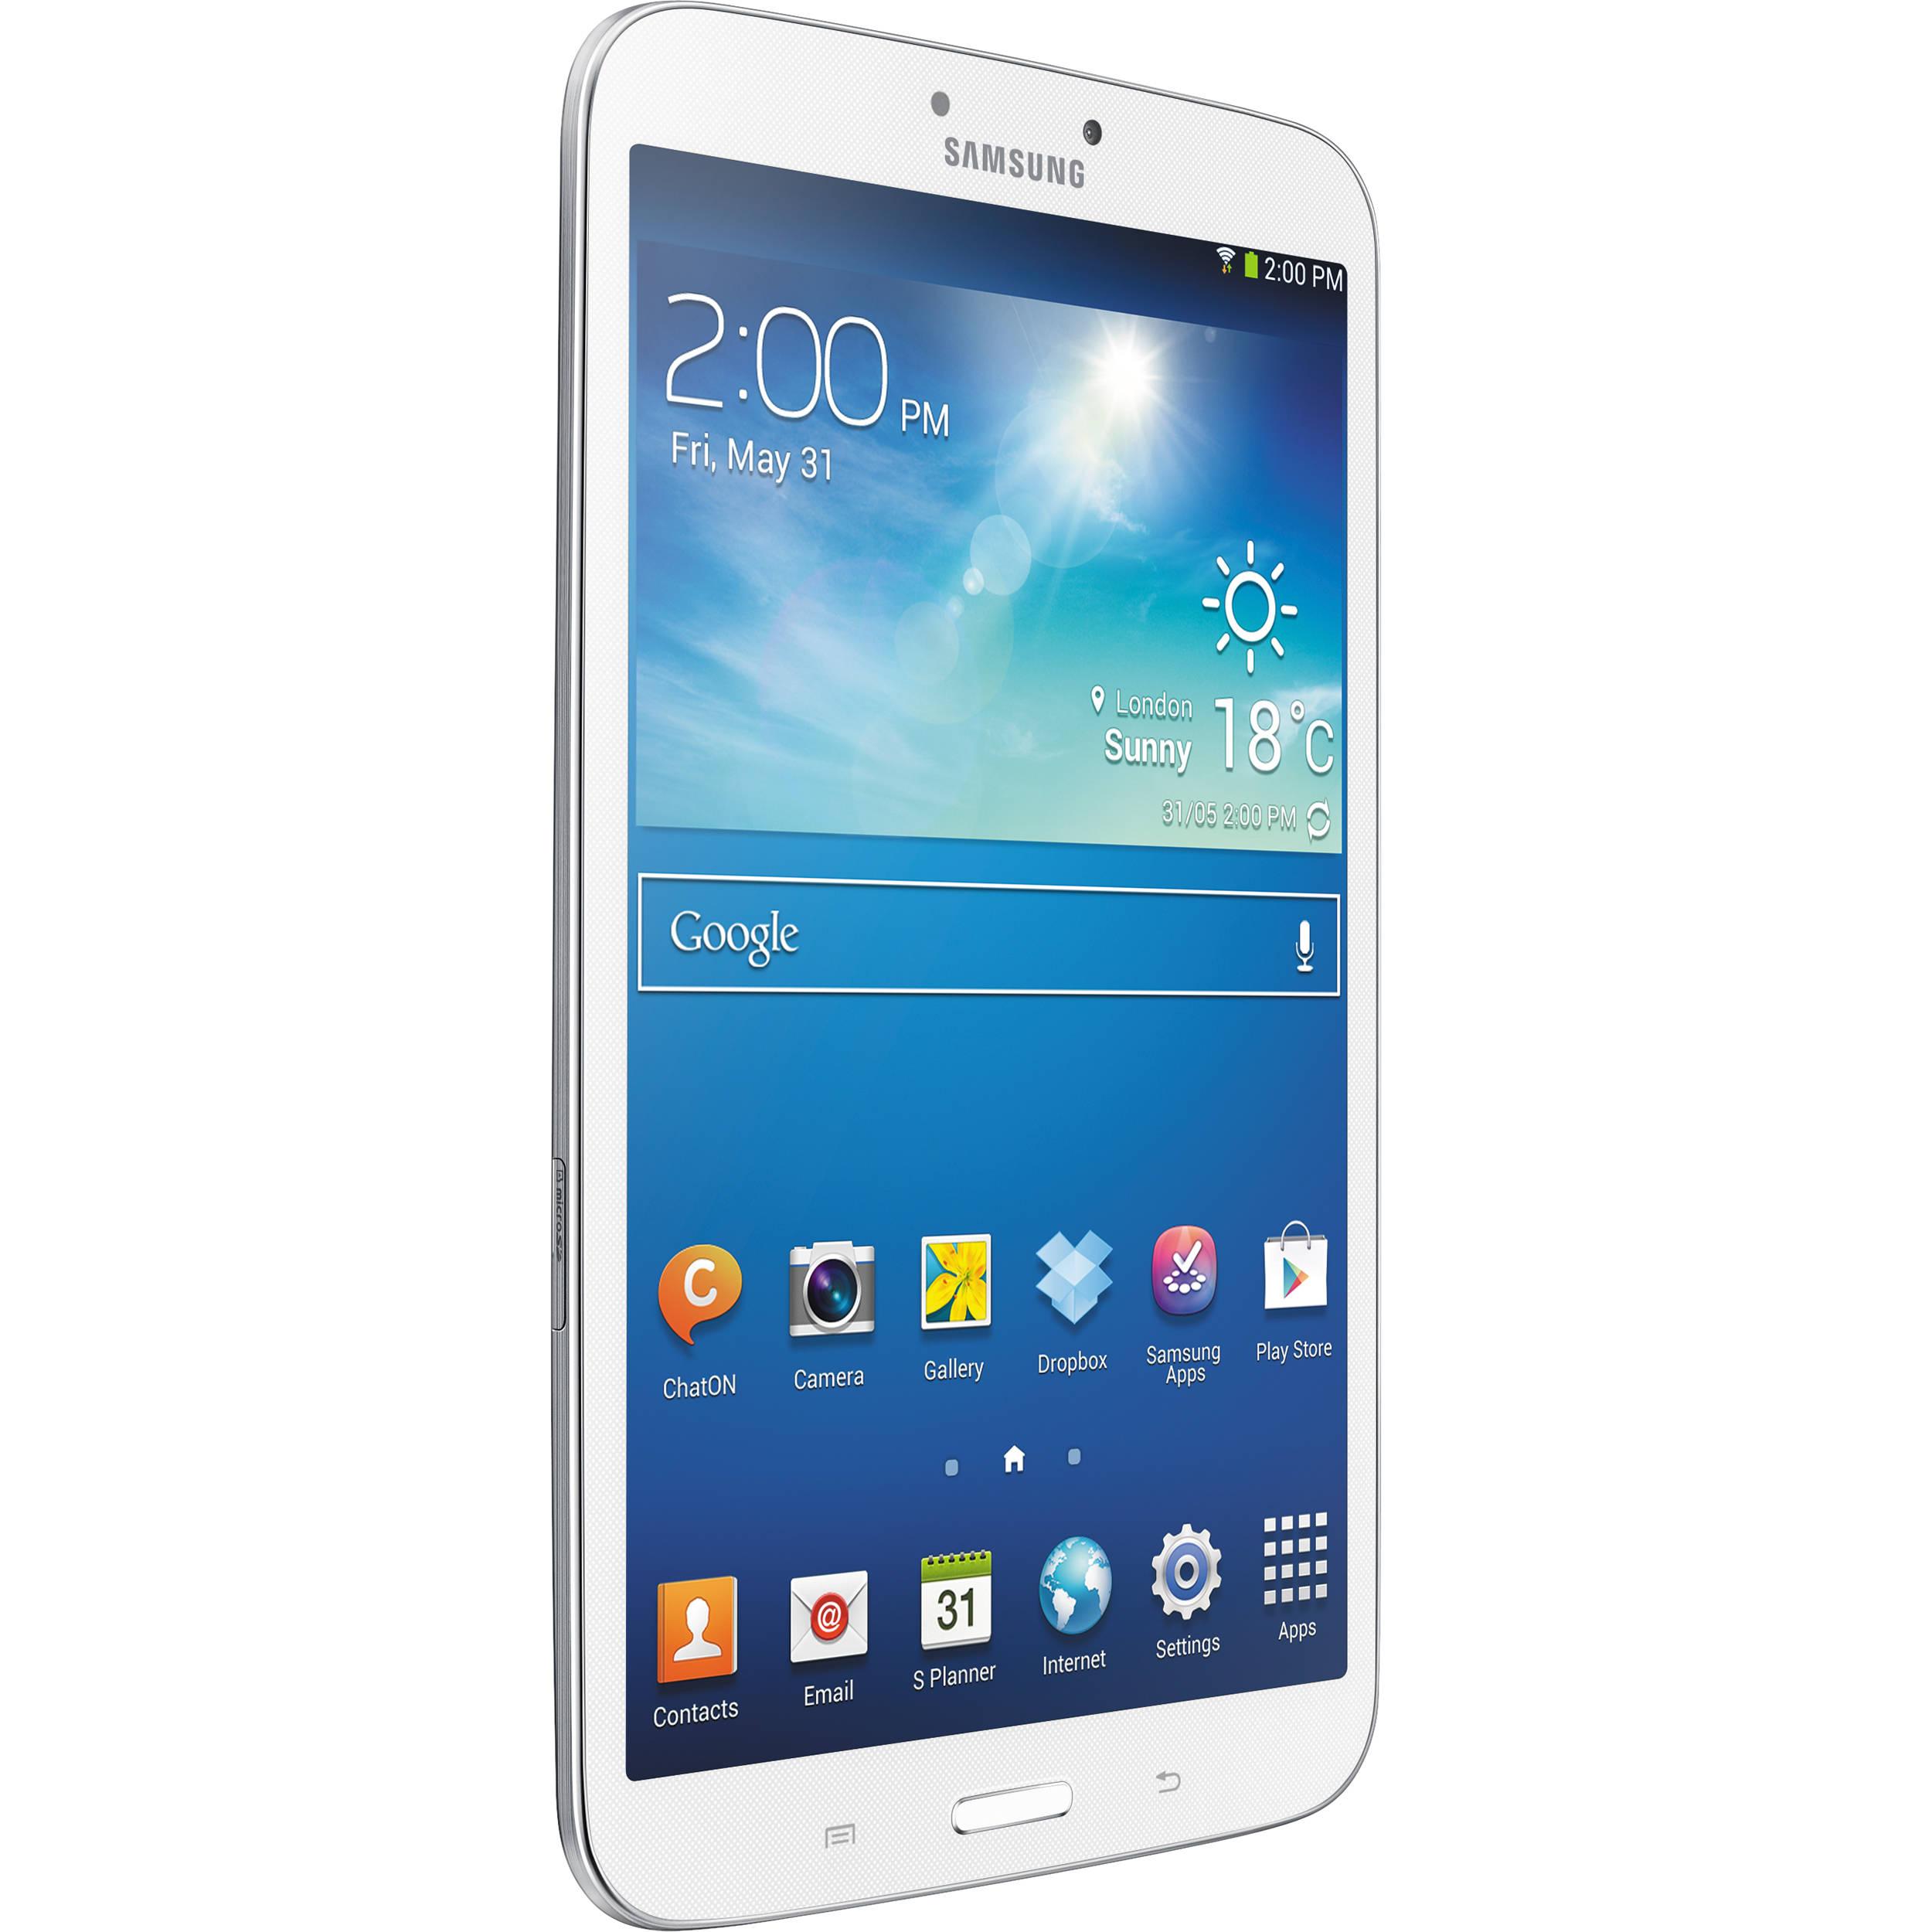 Samsung T3100 Galaxy Tab 3 8.0